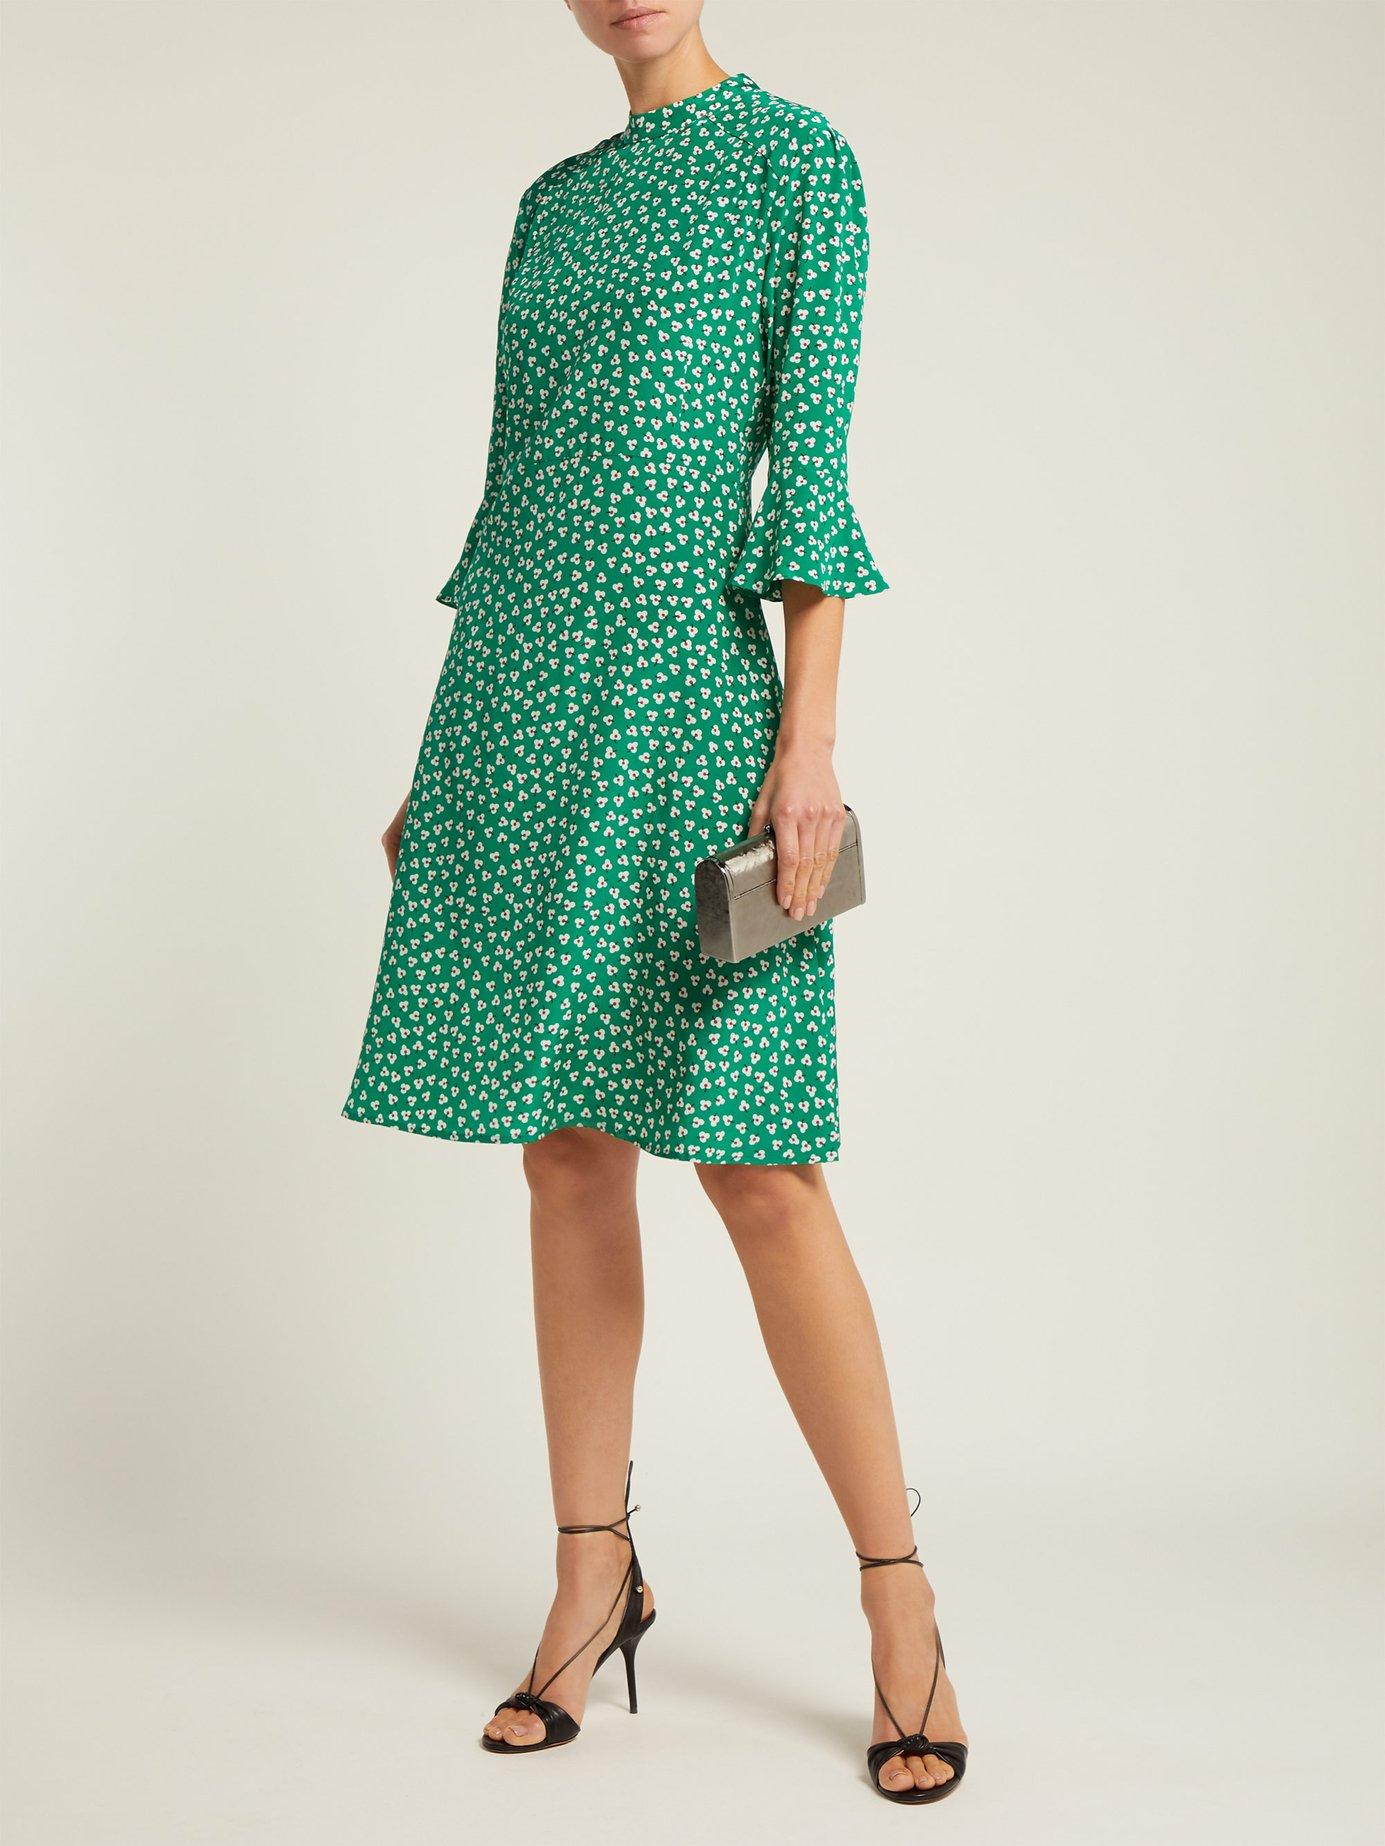 Ashley floral-print silk dress by Hvn